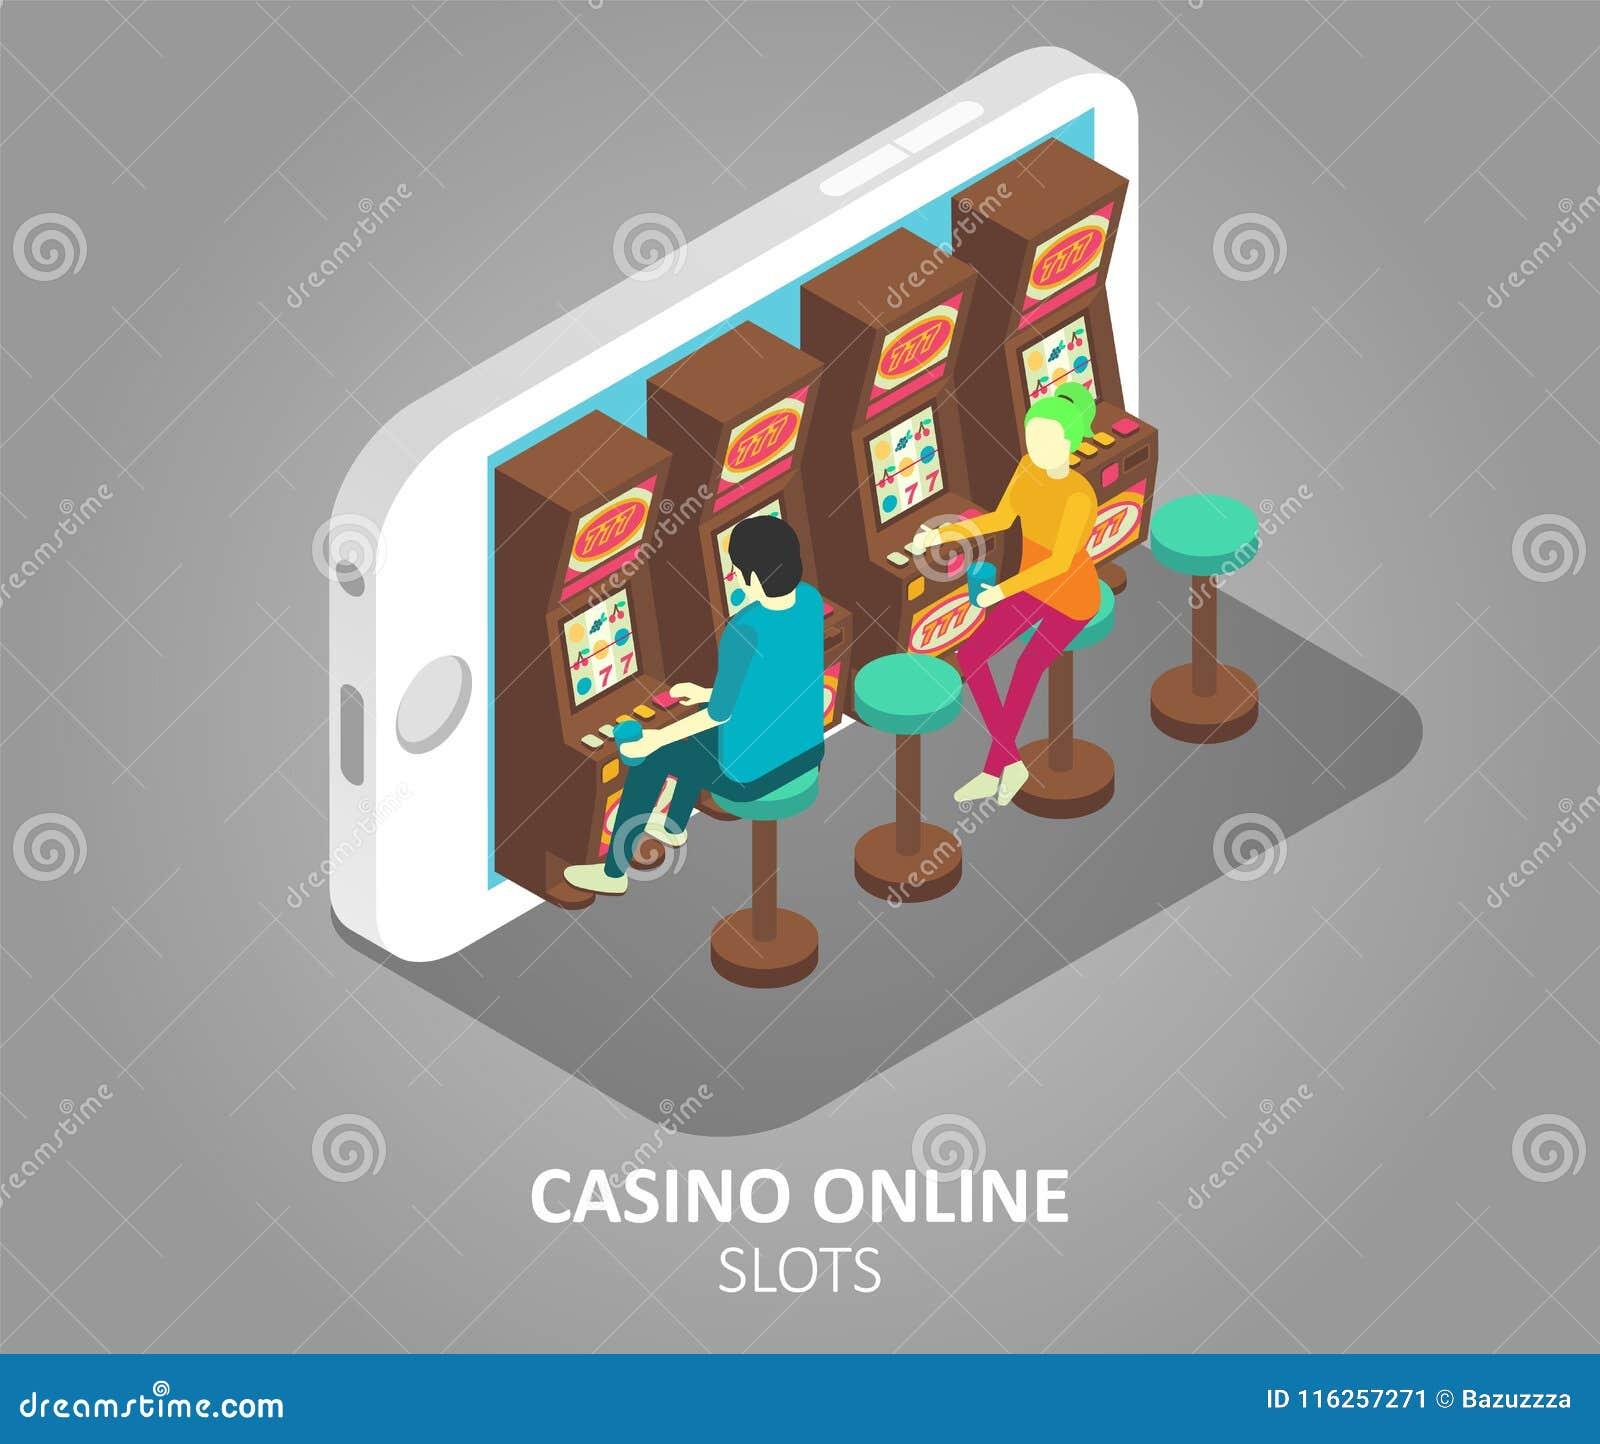 Casino Online Mobile Slots Vector Illustration Stock Vector